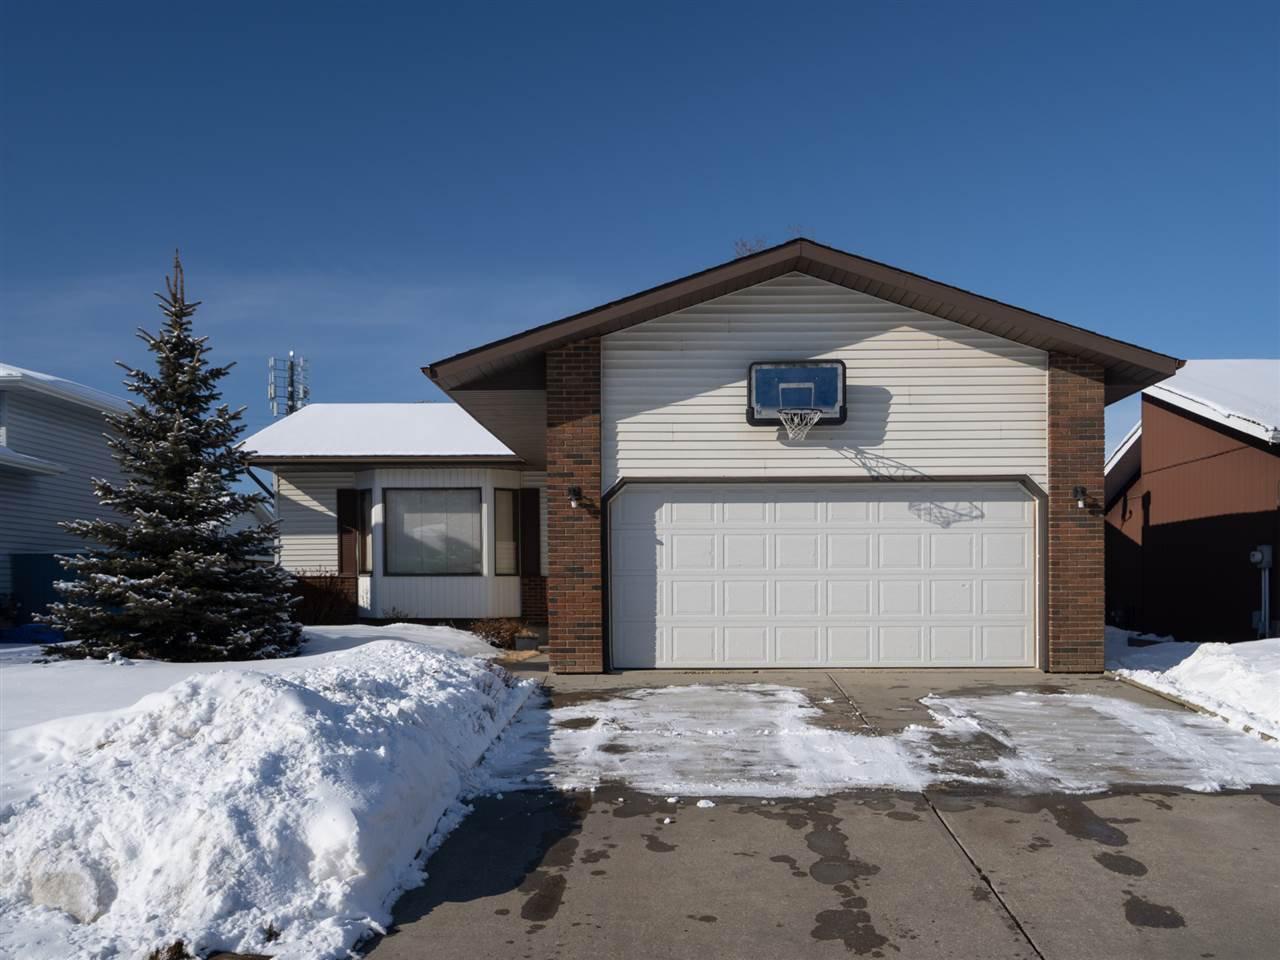 Main Photo: 18924 99A Avenue in Edmonton: Zone 20 House for sale : MLS®# E4191000